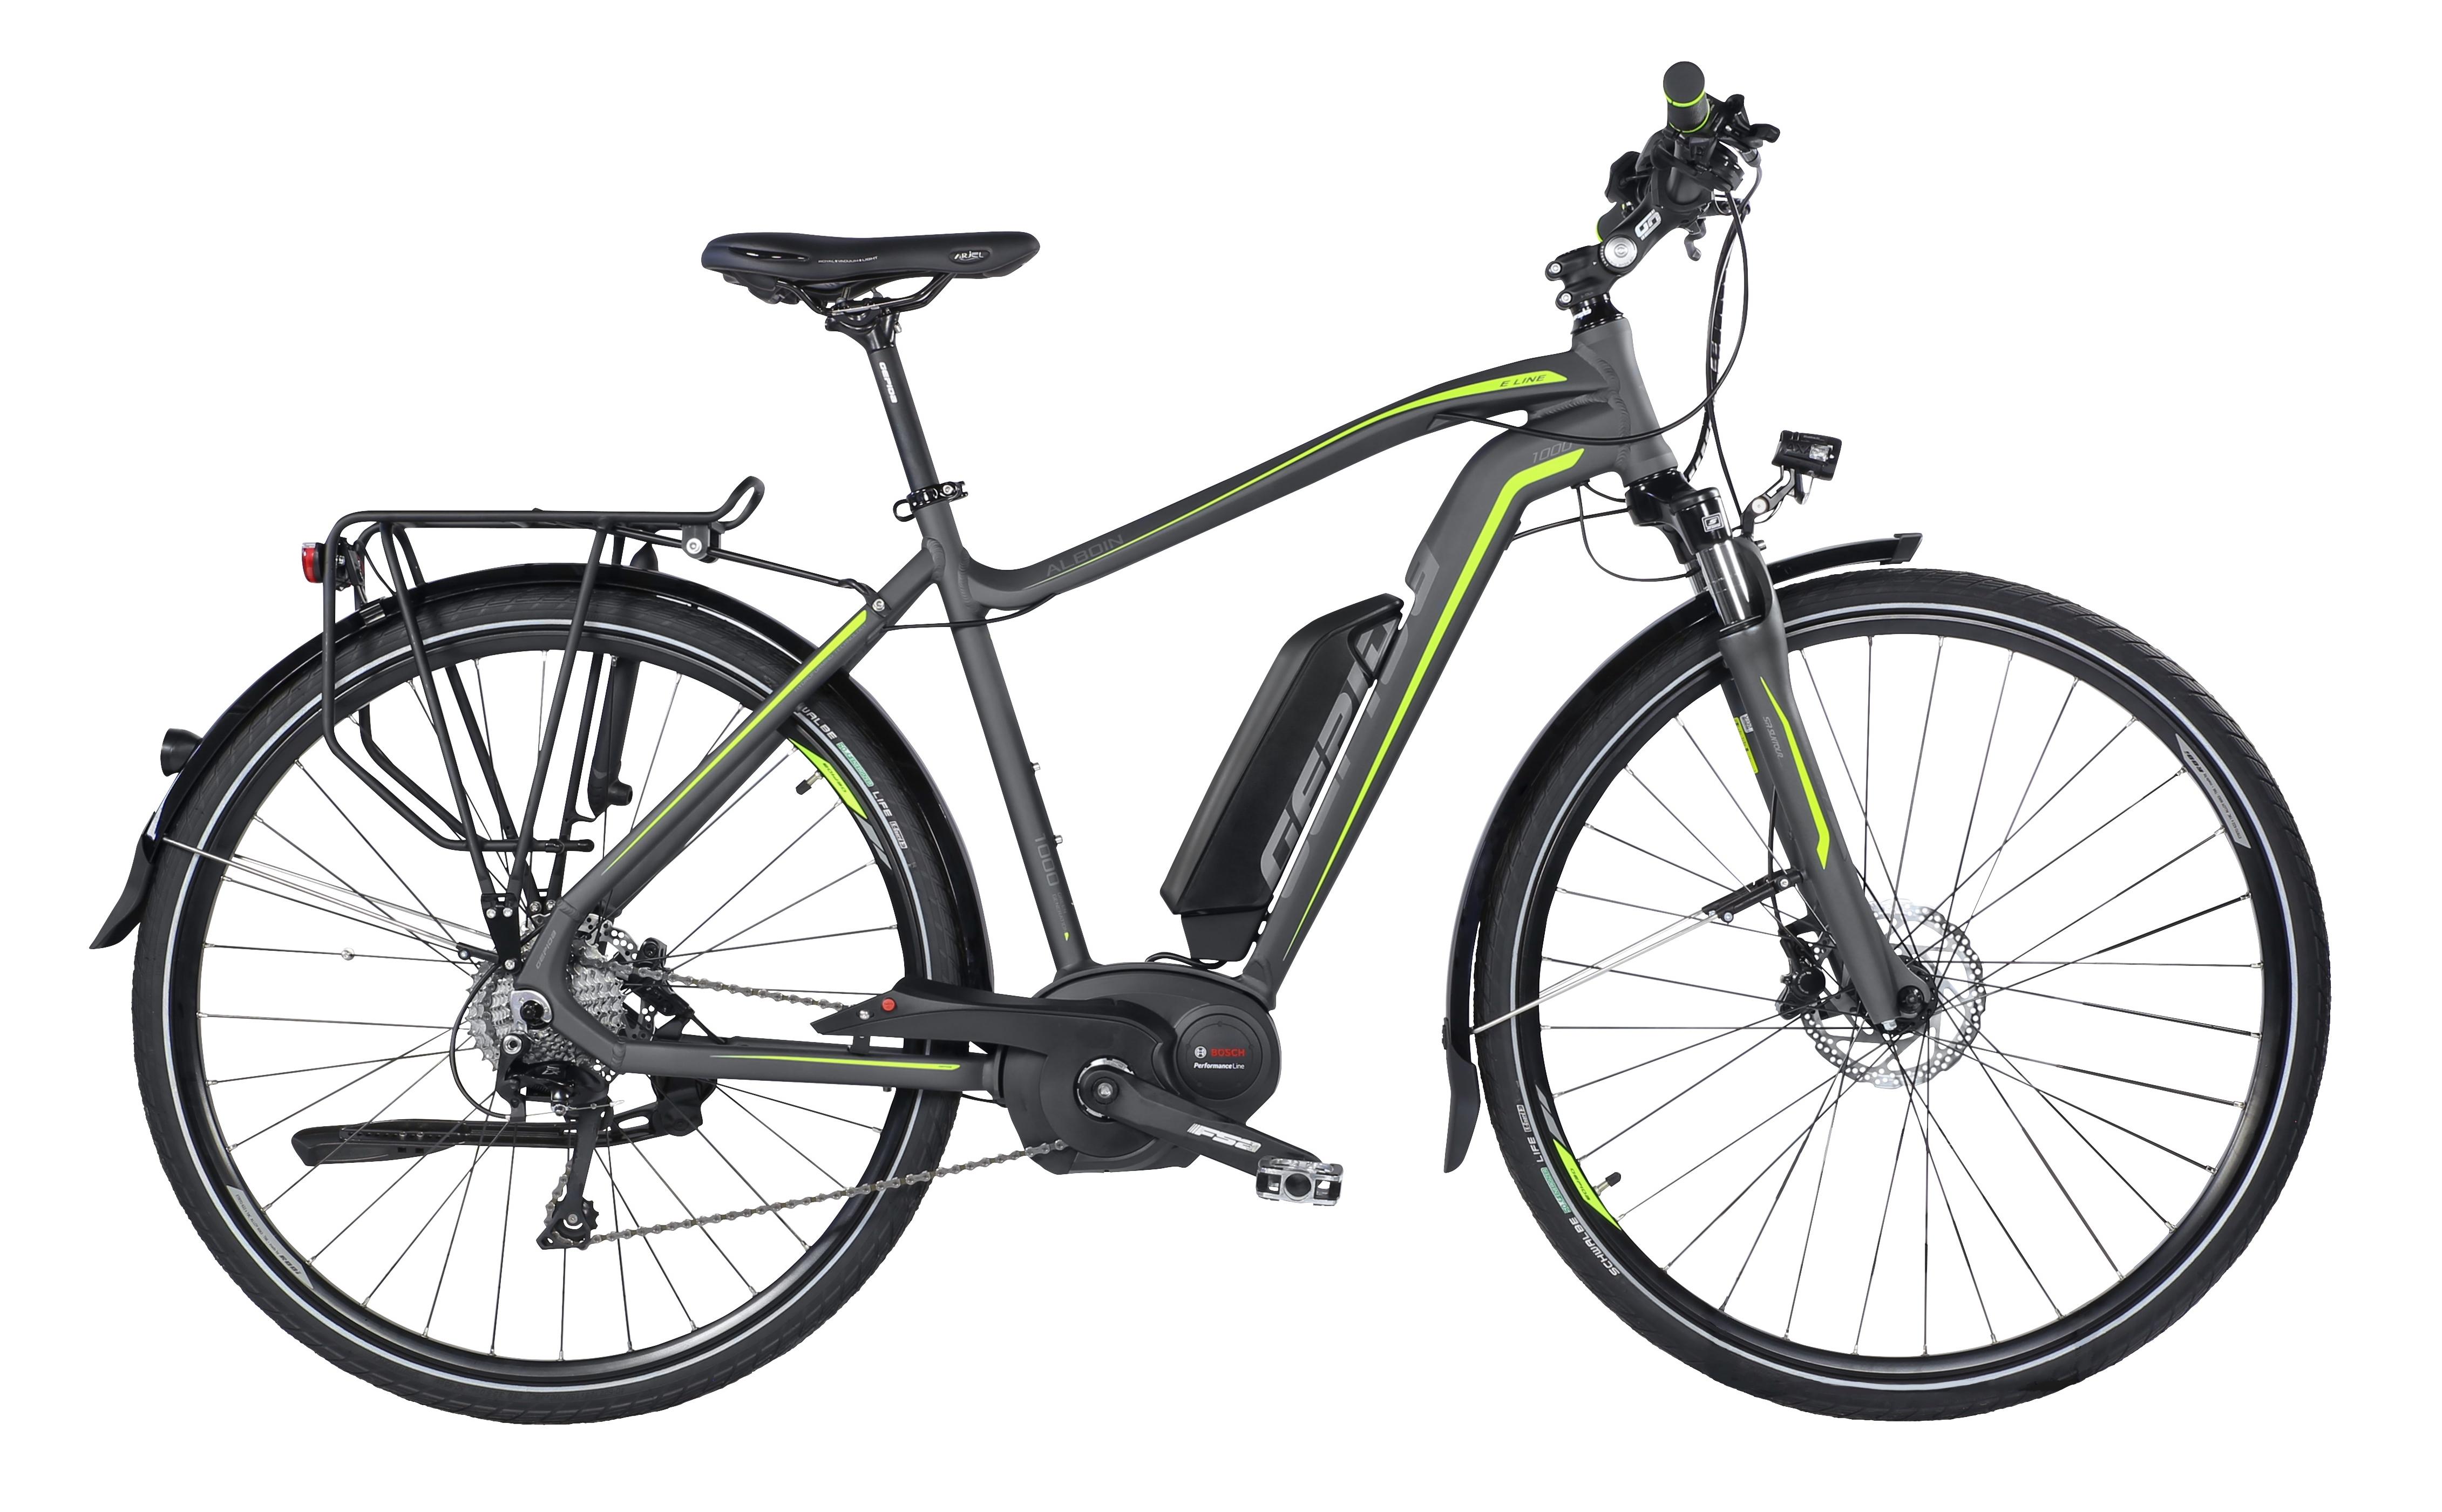 kolo e-bikeALBOIN 1000 28